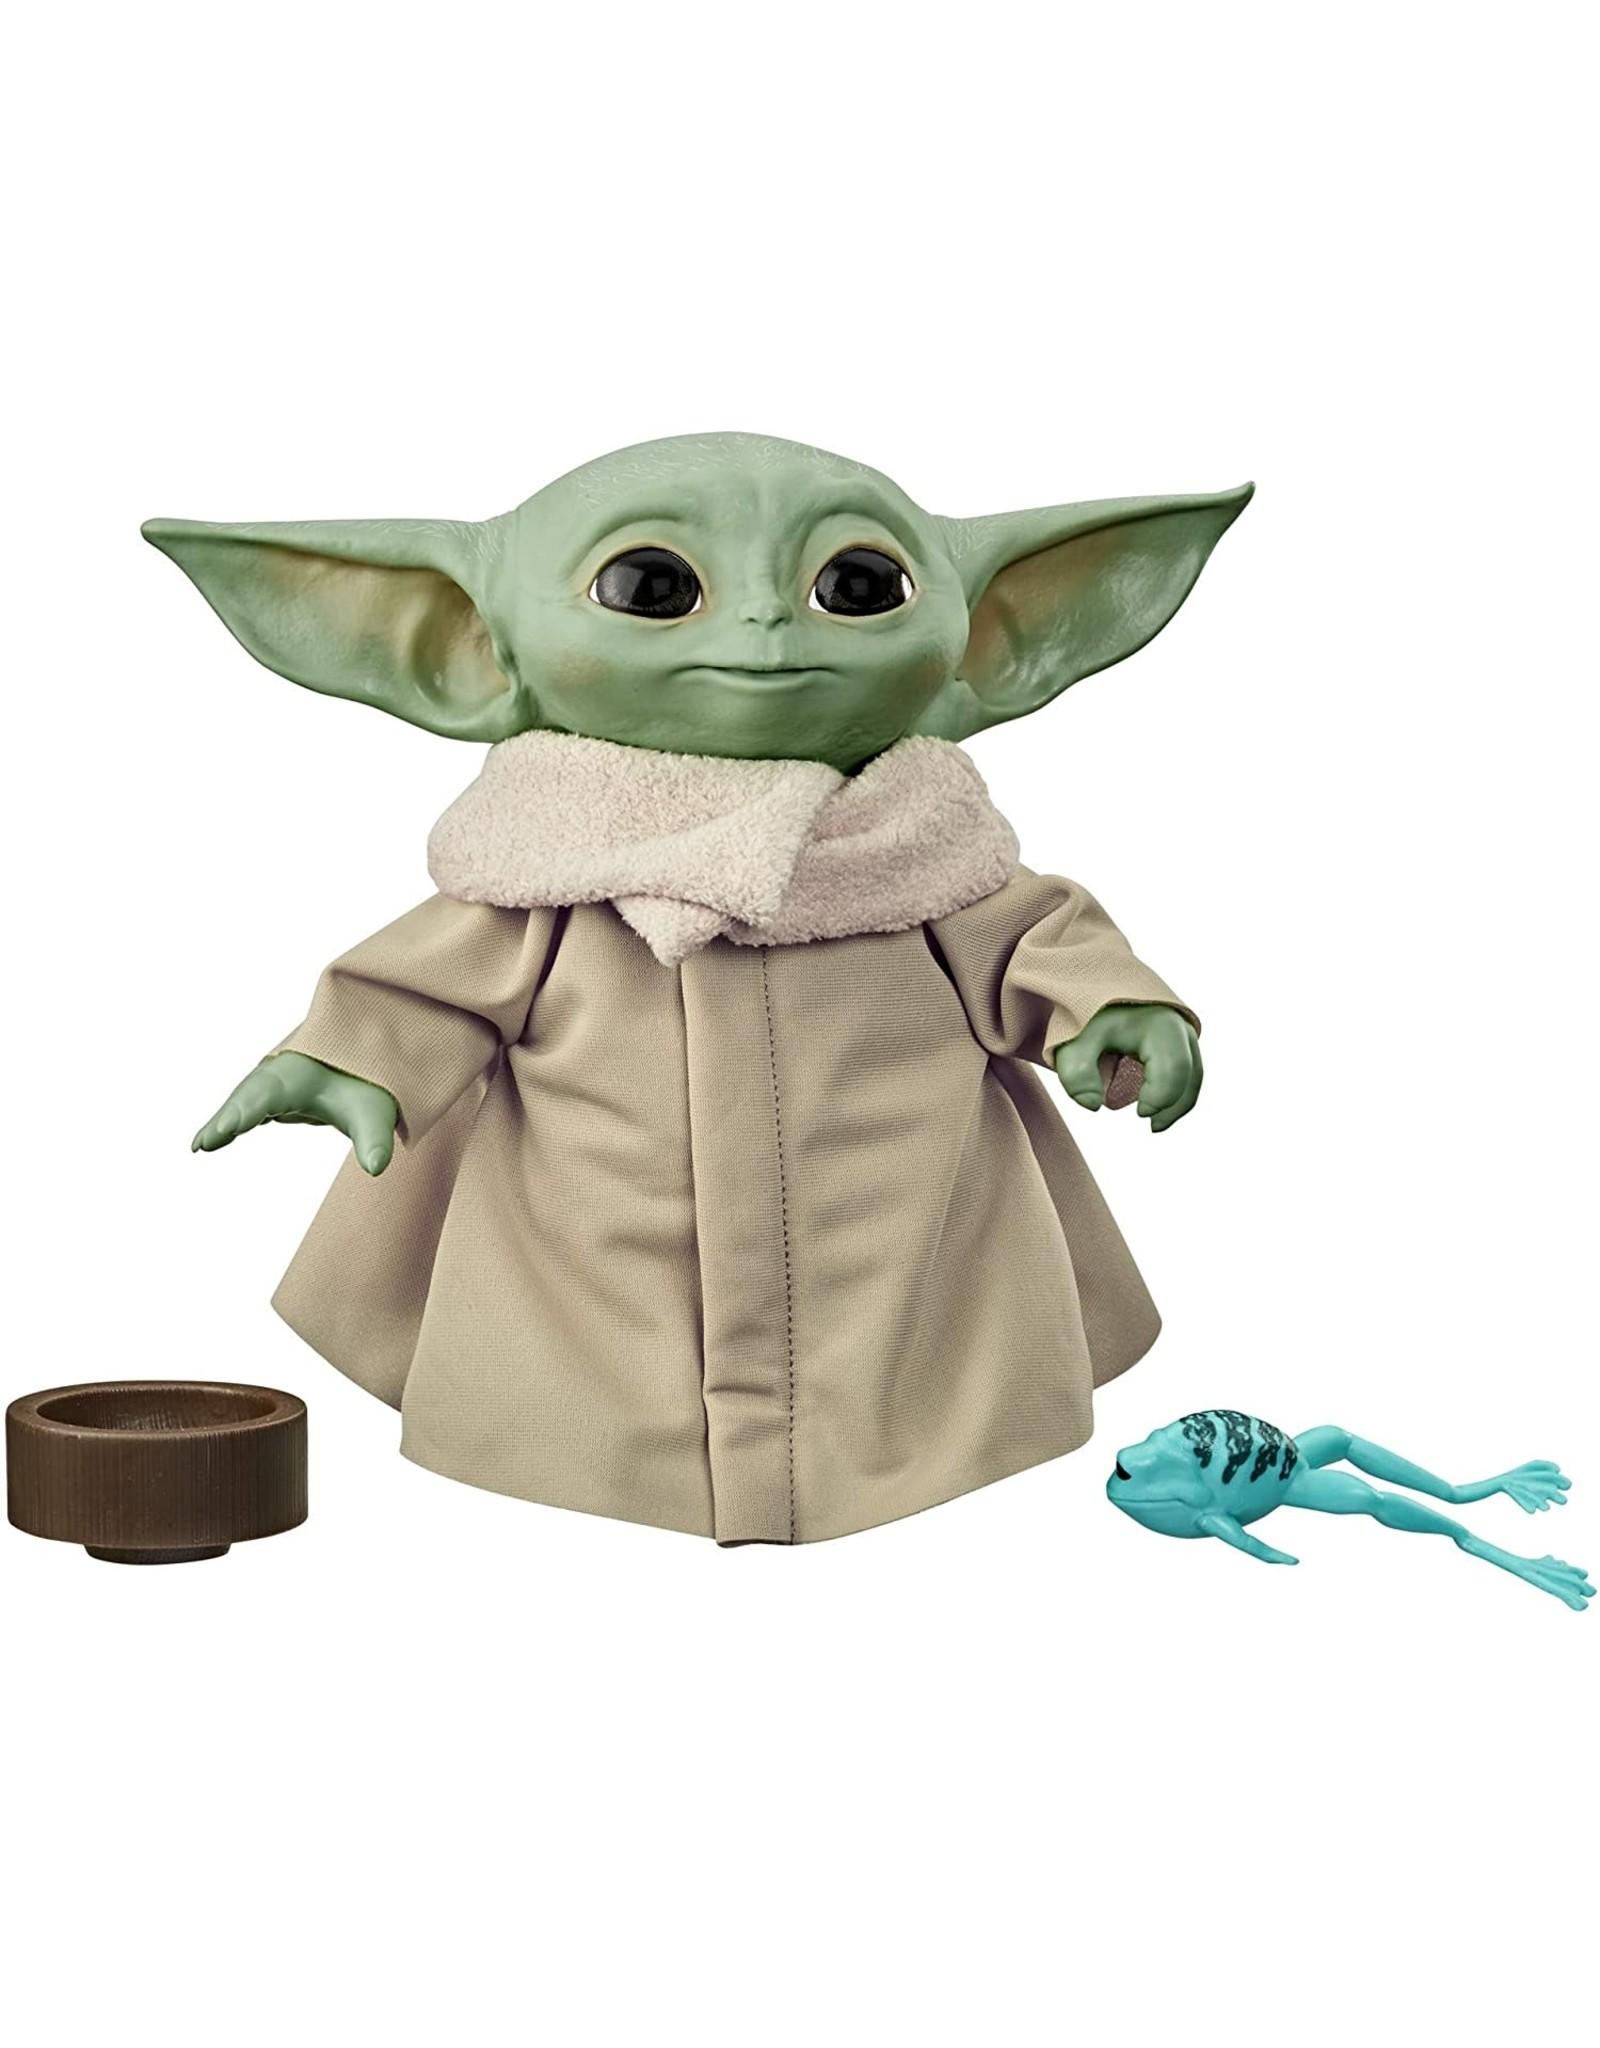 ACD Toys Star Wars, The Mandalorian, The Child Talking Plush